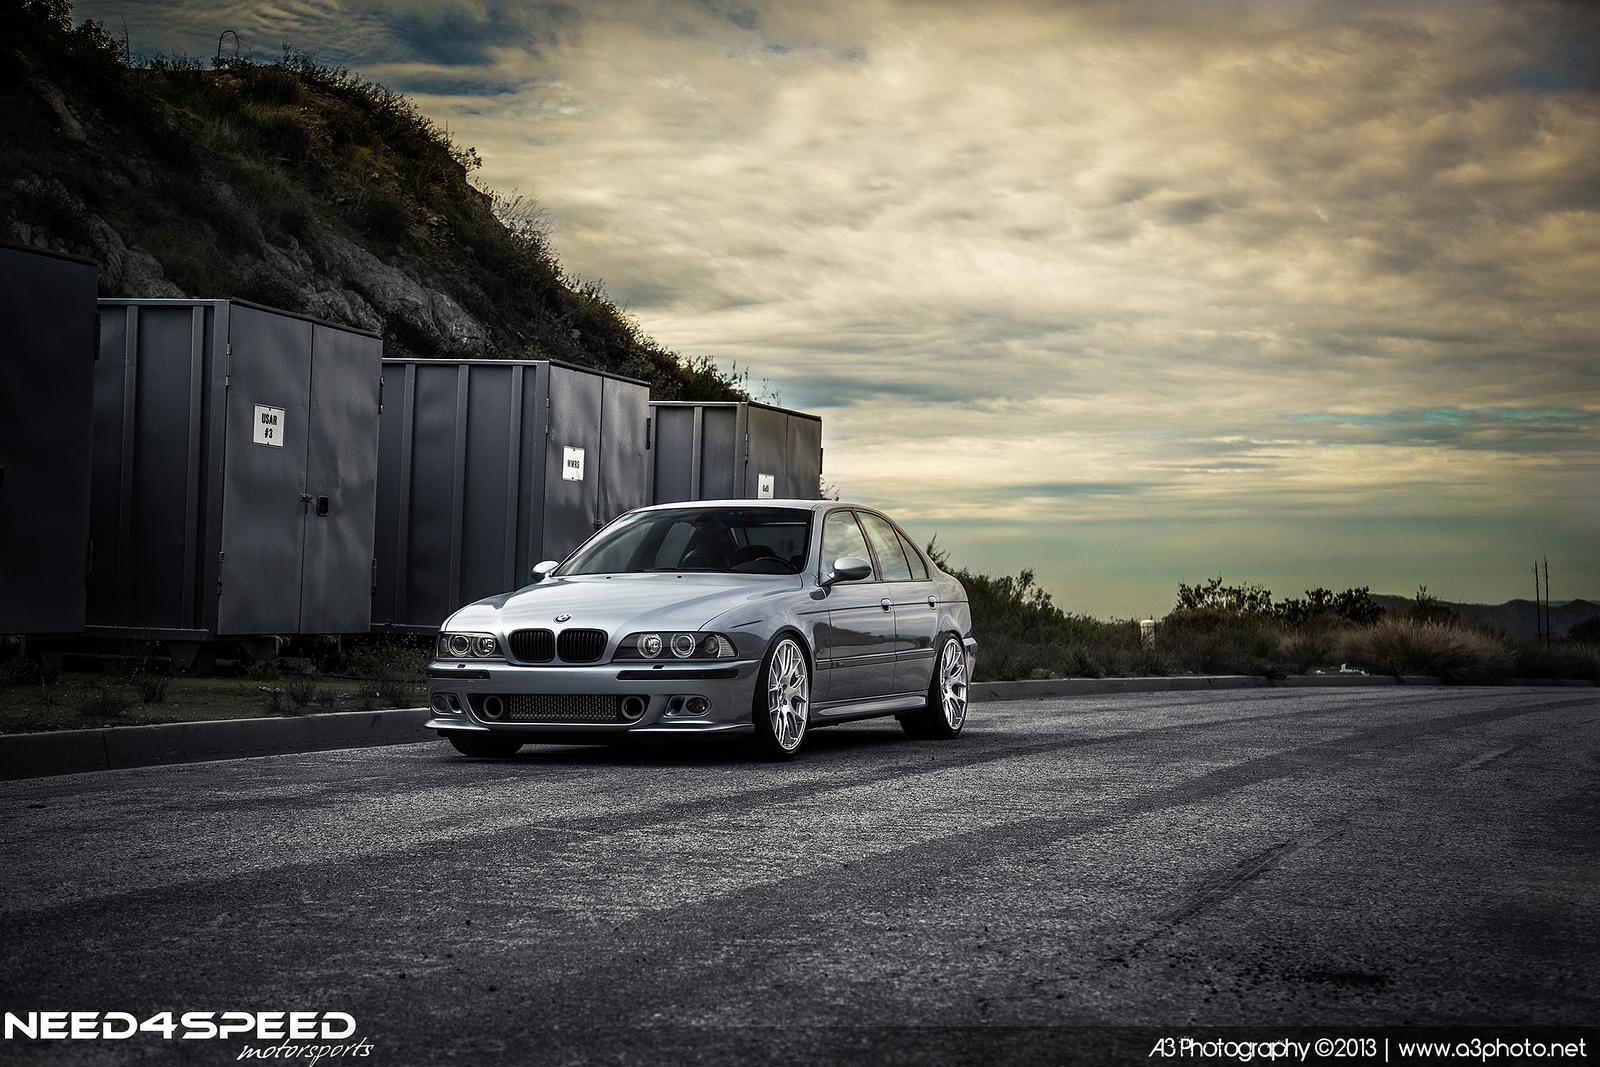 Take a Walk Down Memory Lane with This Custom BMW E39 M5 - autoevolution